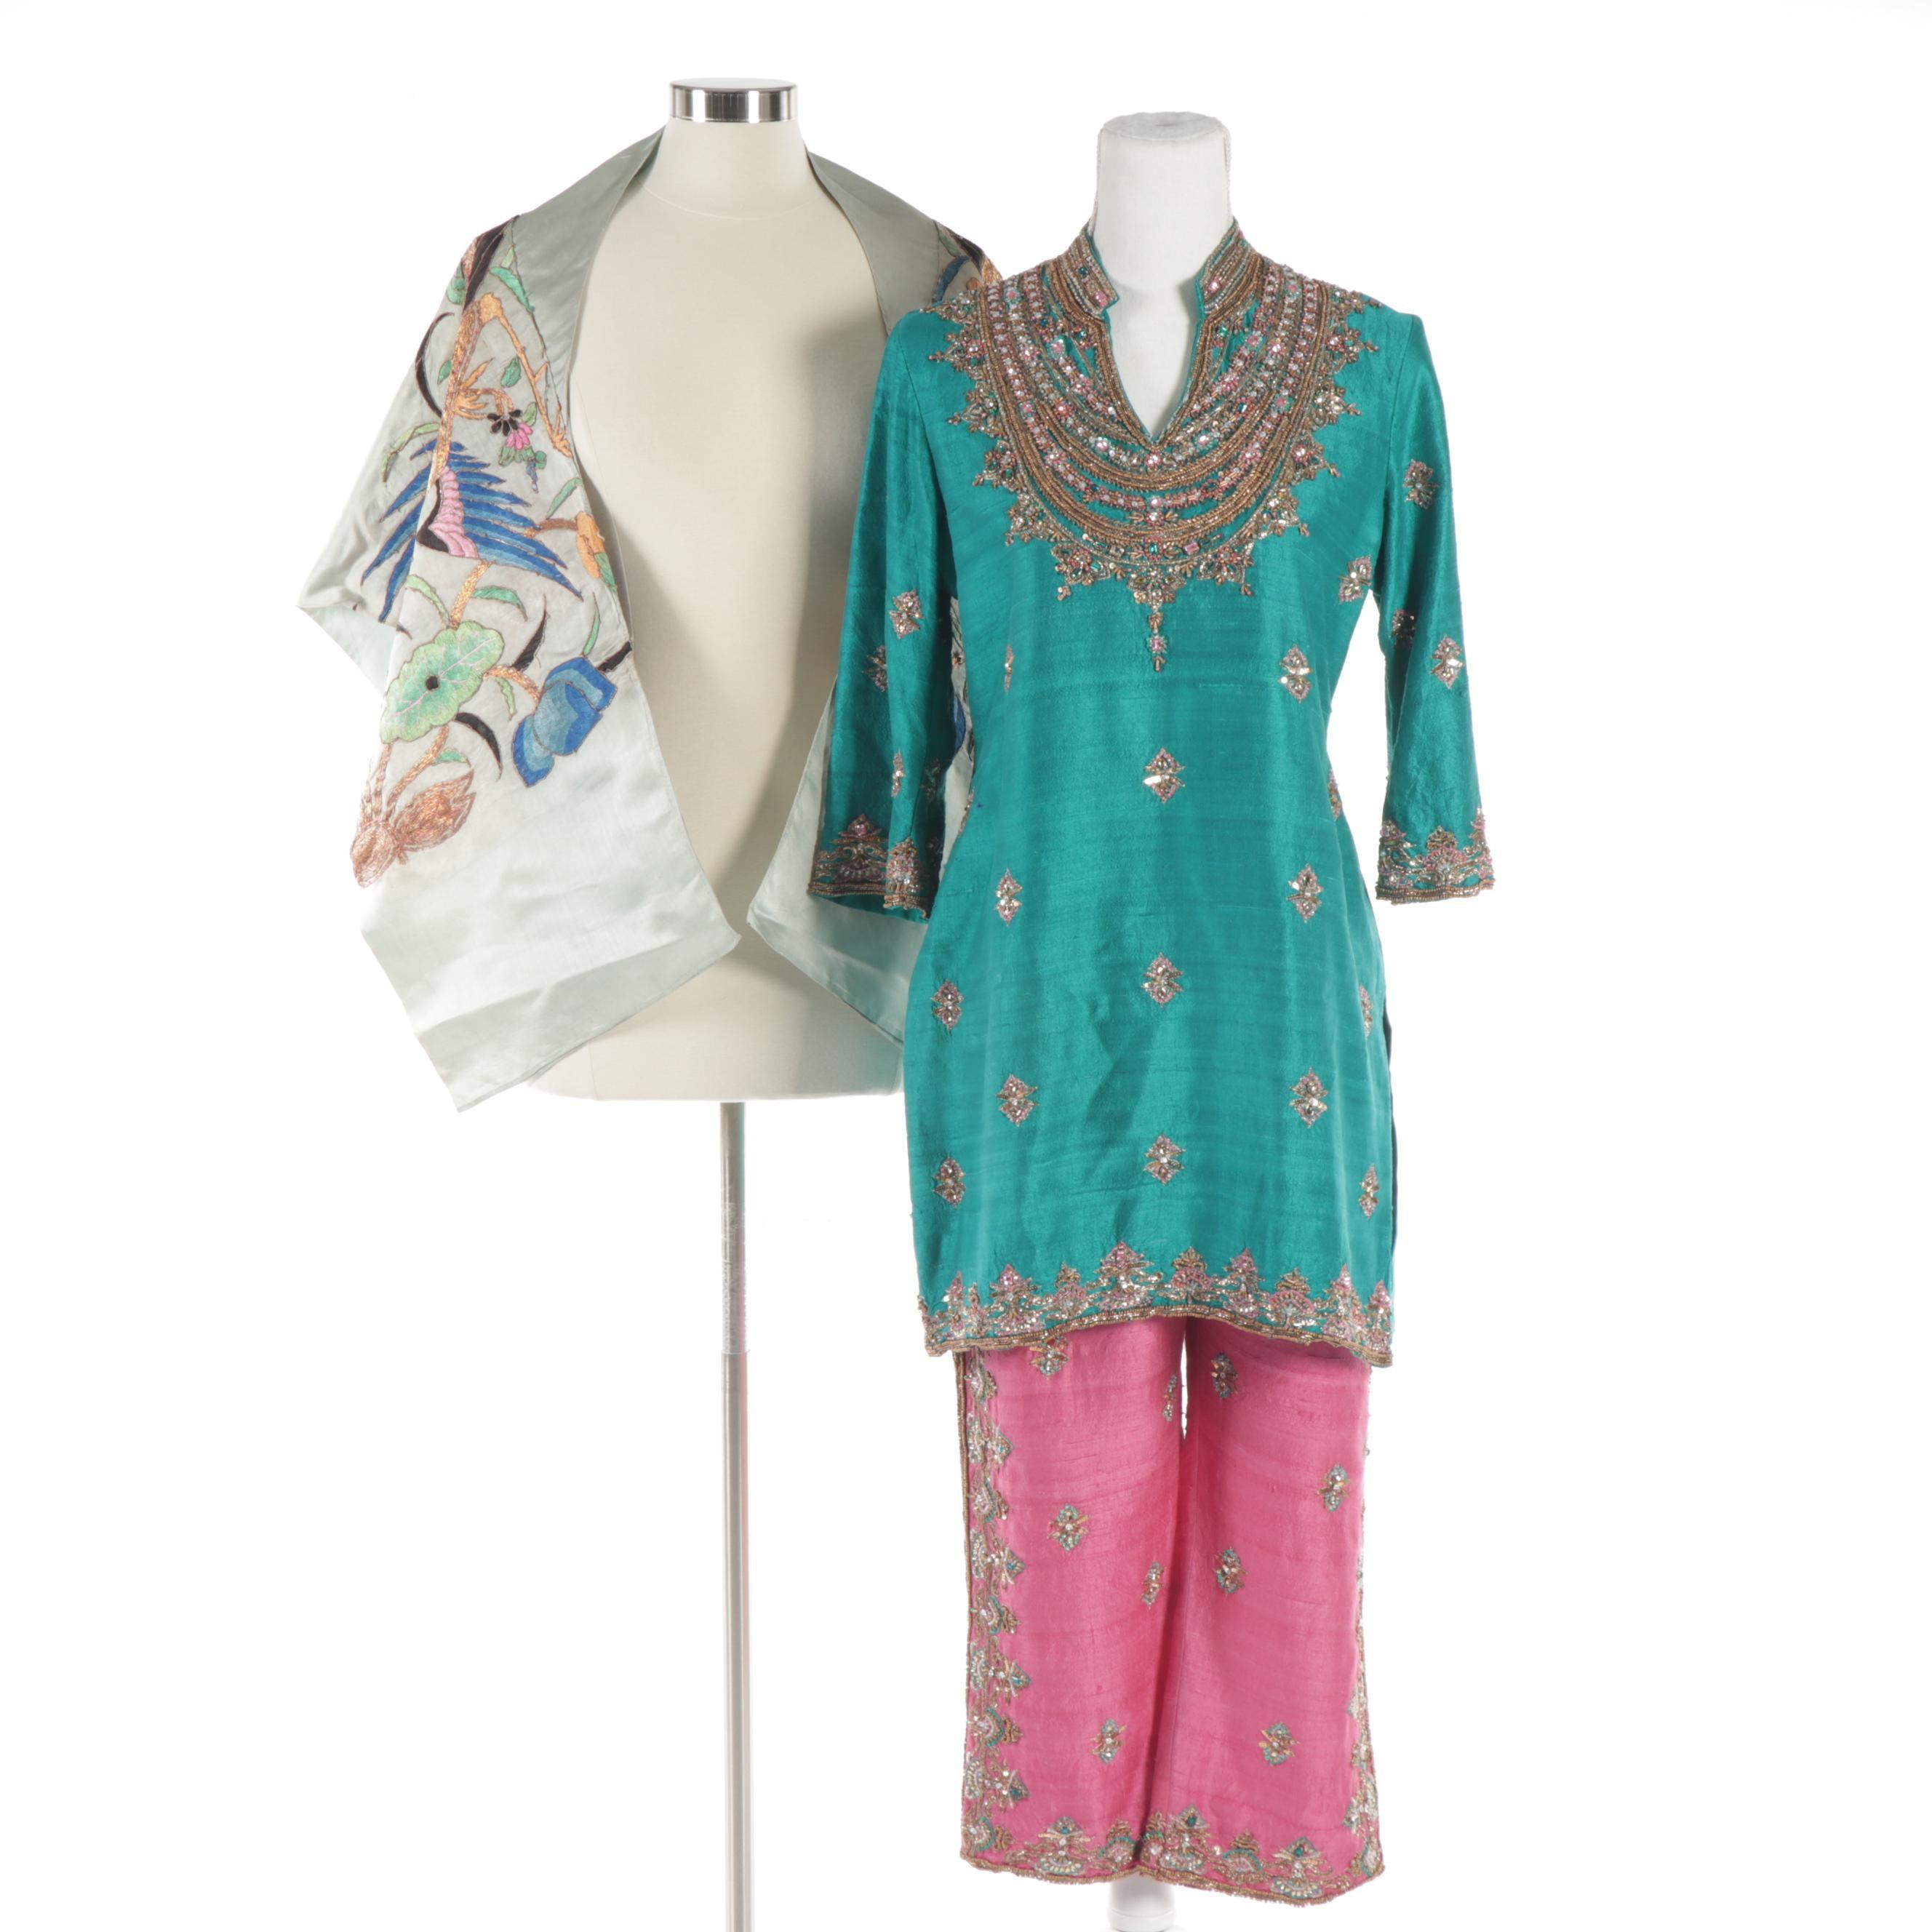 Women's Shefaali Hegde for Sahil Beaded Silk Garments and Silk Embroidered Shawl